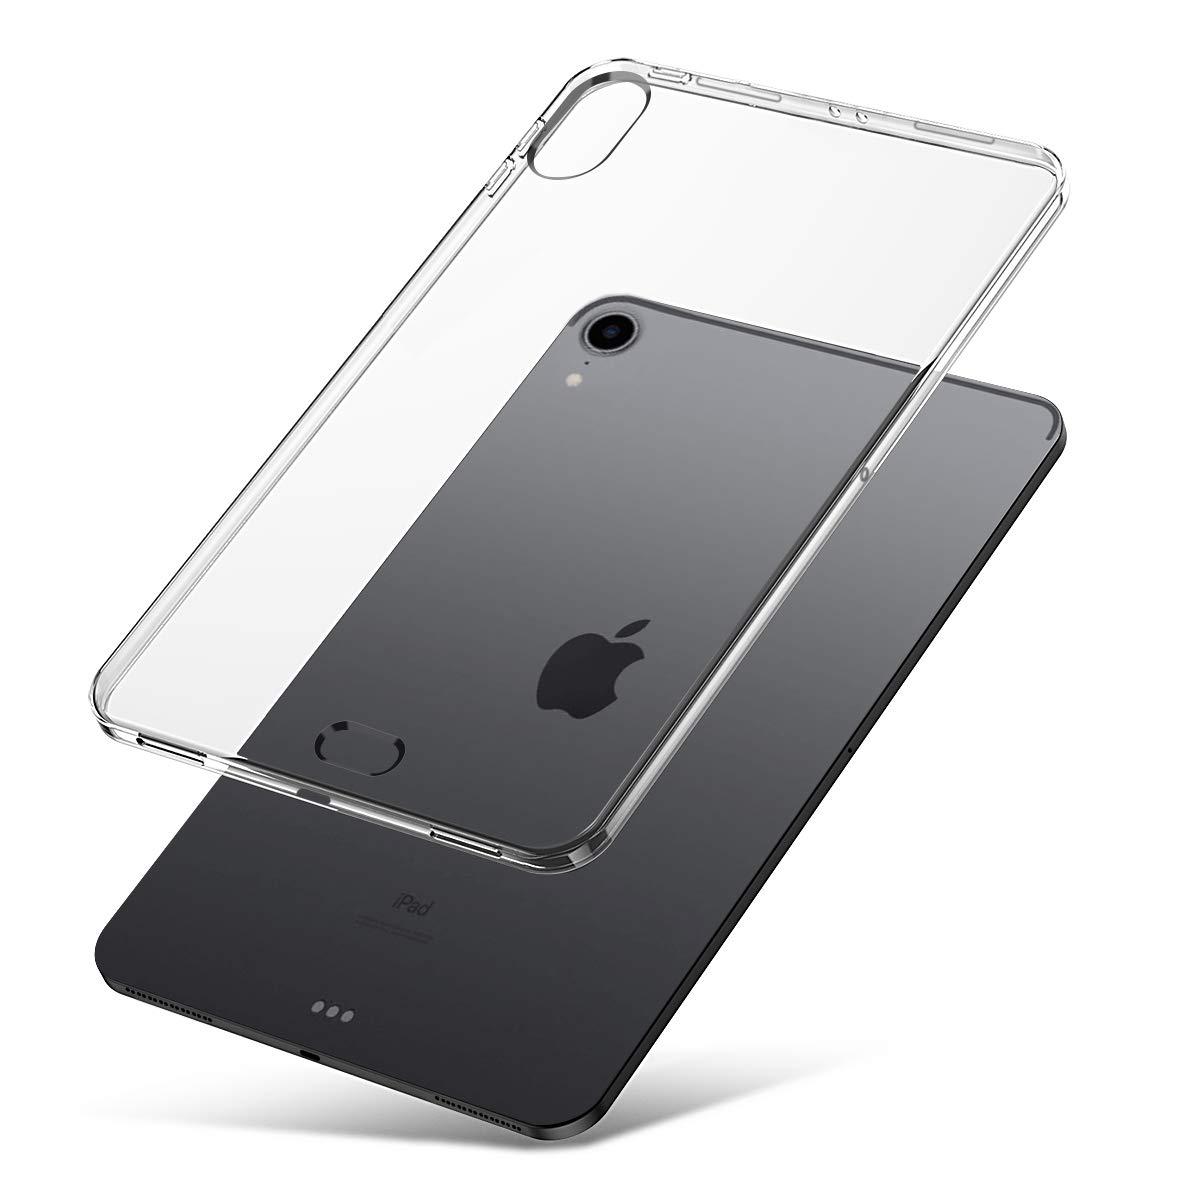 J&D Compatible para iPad Pro 12.9 2018 Funda, [Cojín Delgado] [Parachoques Ligero] [Transparente] Resistente Tablet Clear Funda TPU Caucho Protectora ...